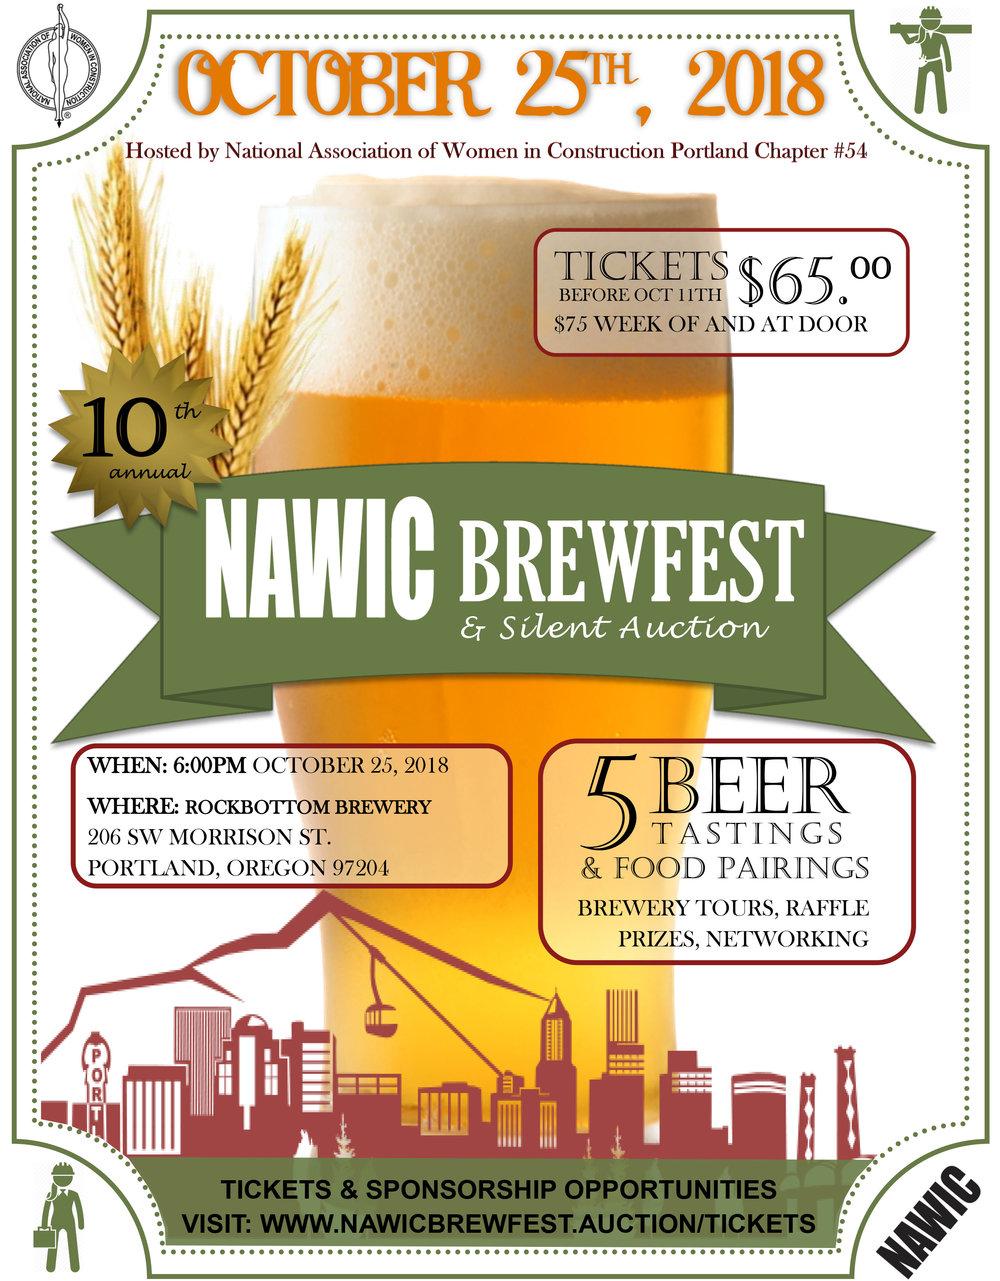 2018 Brewfest invite.jpg